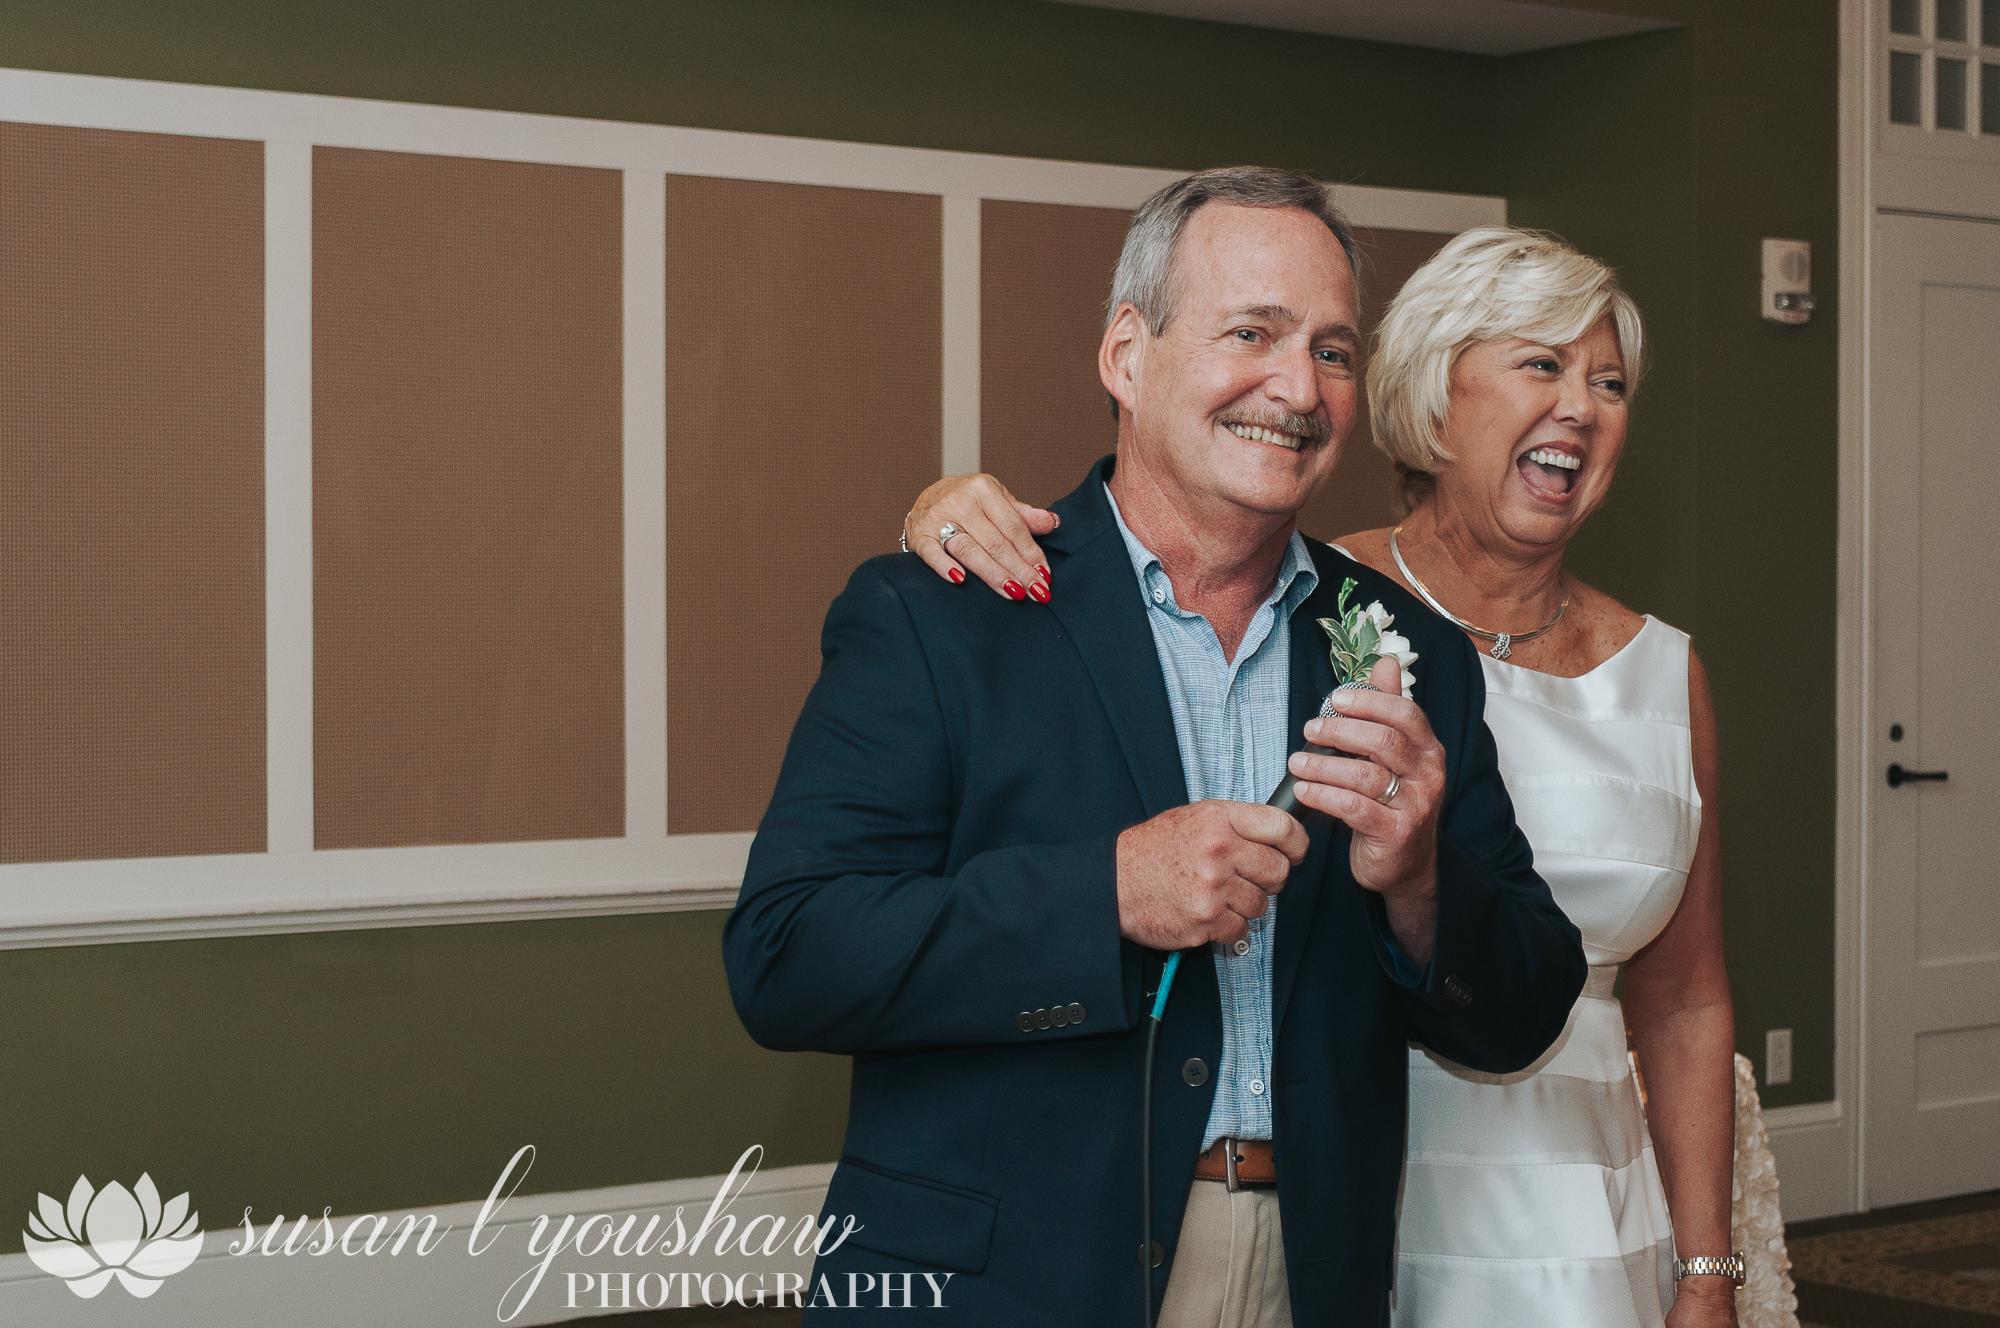 BLOG Carolyn Adams and Jim McCune 07-04-2018 SLY Photography-143.jpg